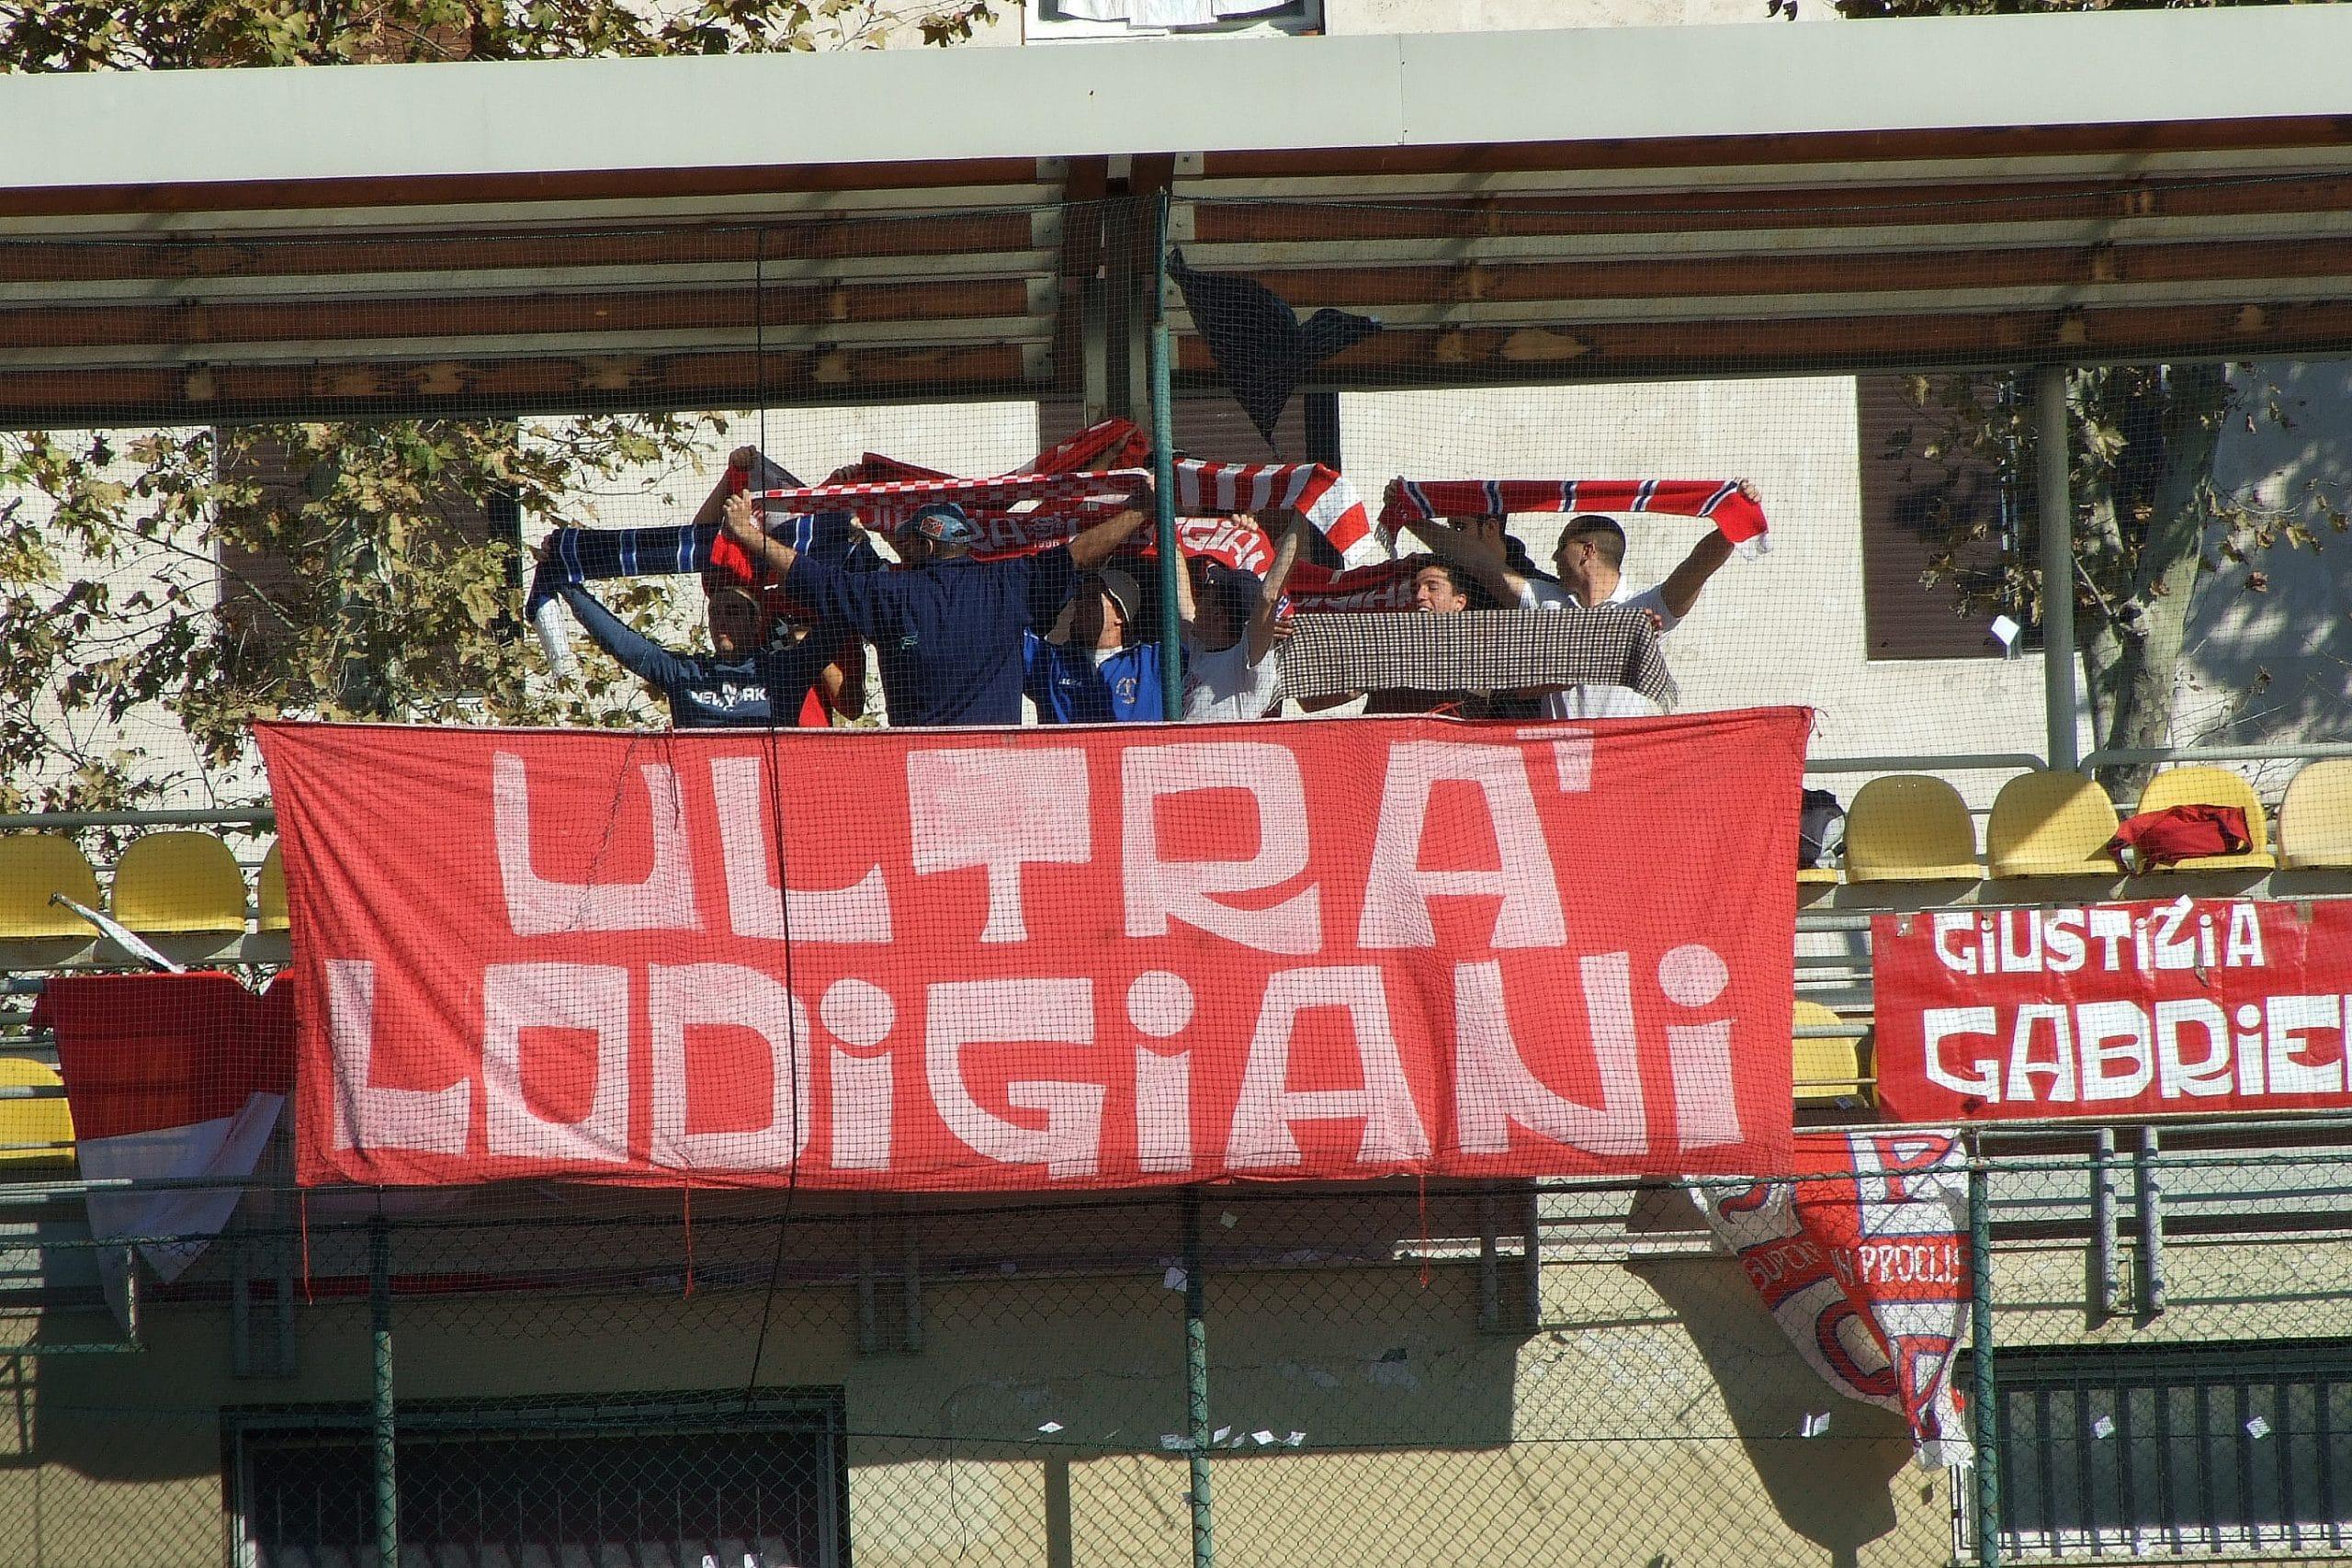 garbatella09-42